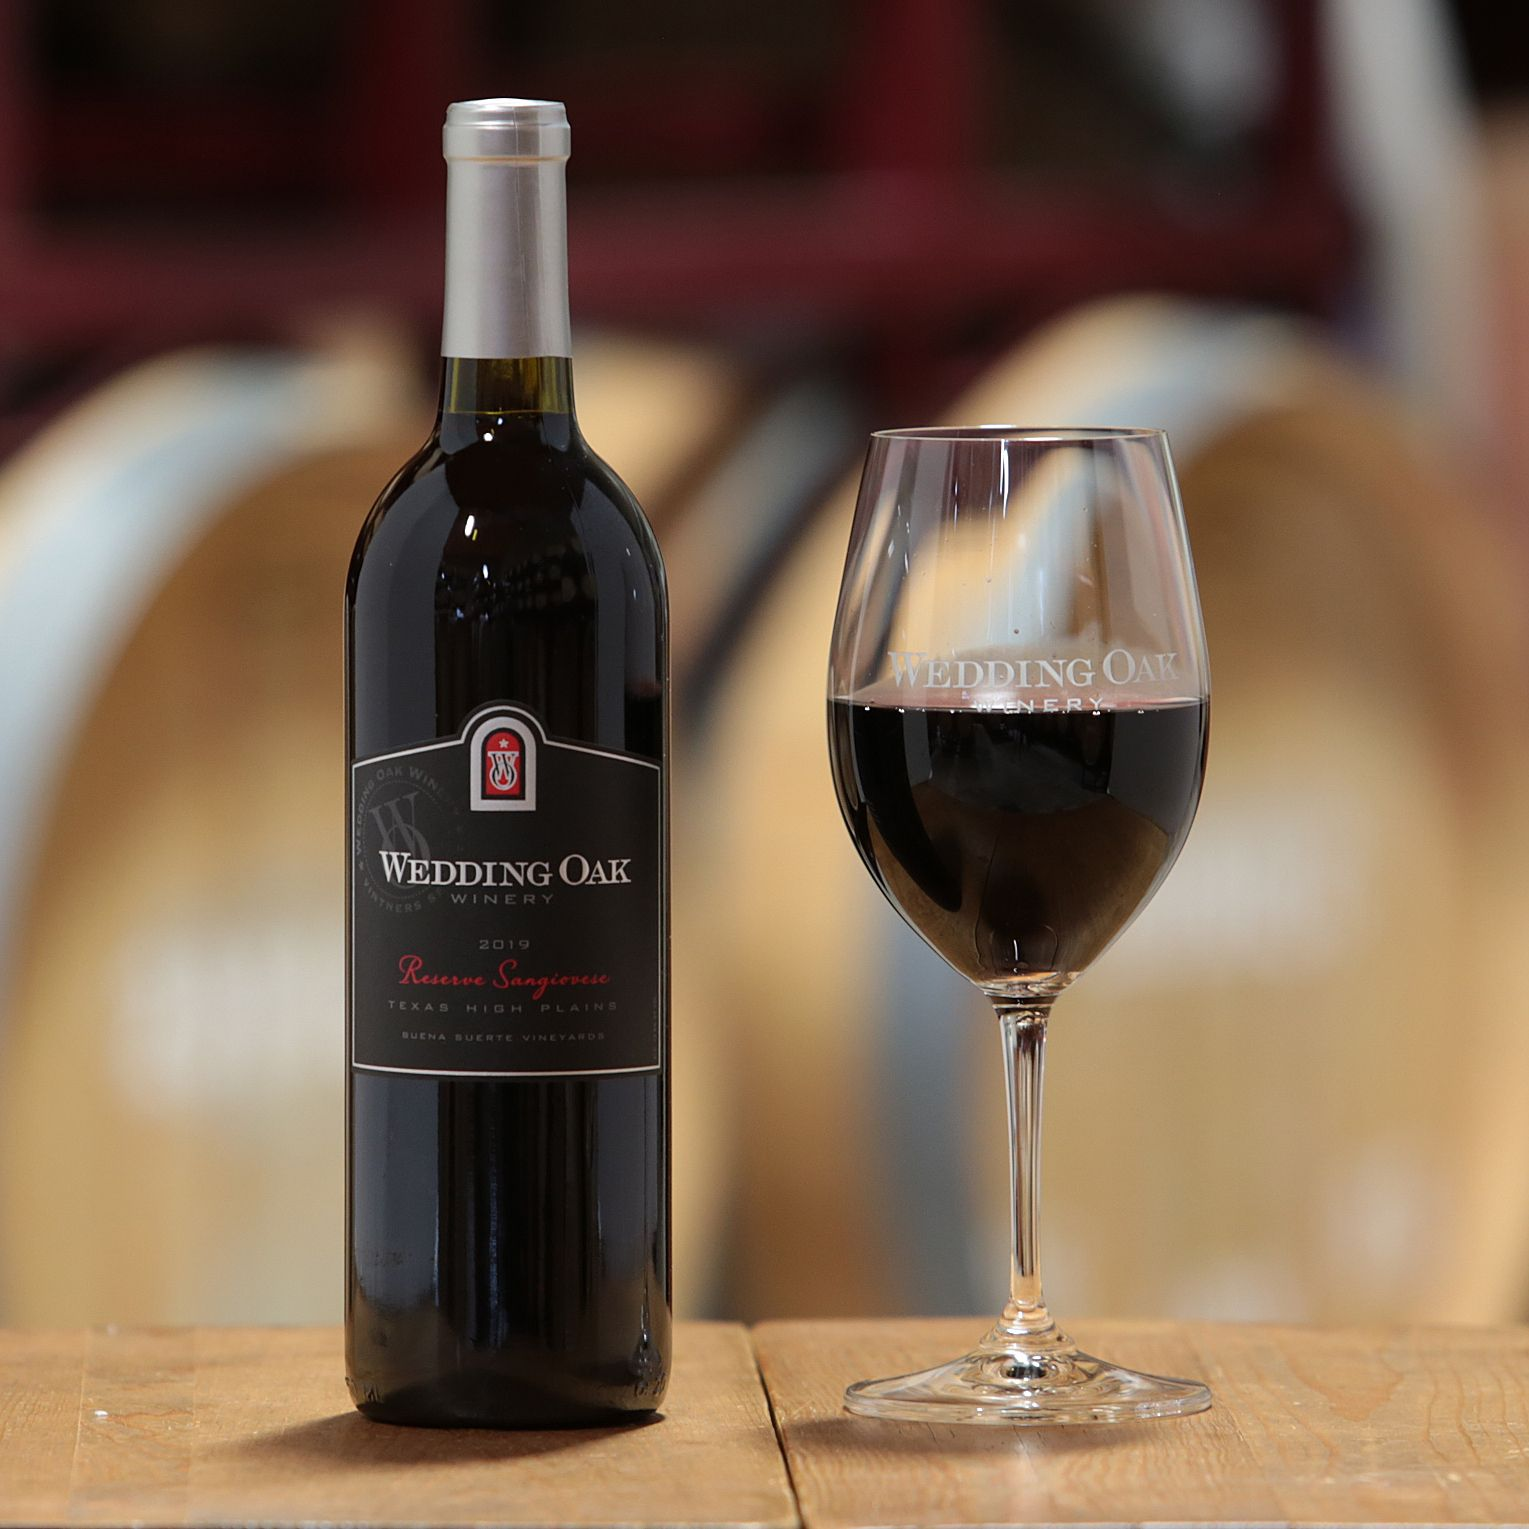 Sangiovese Reserve Texas High Plains, Buena Suerte Vineyards 2019